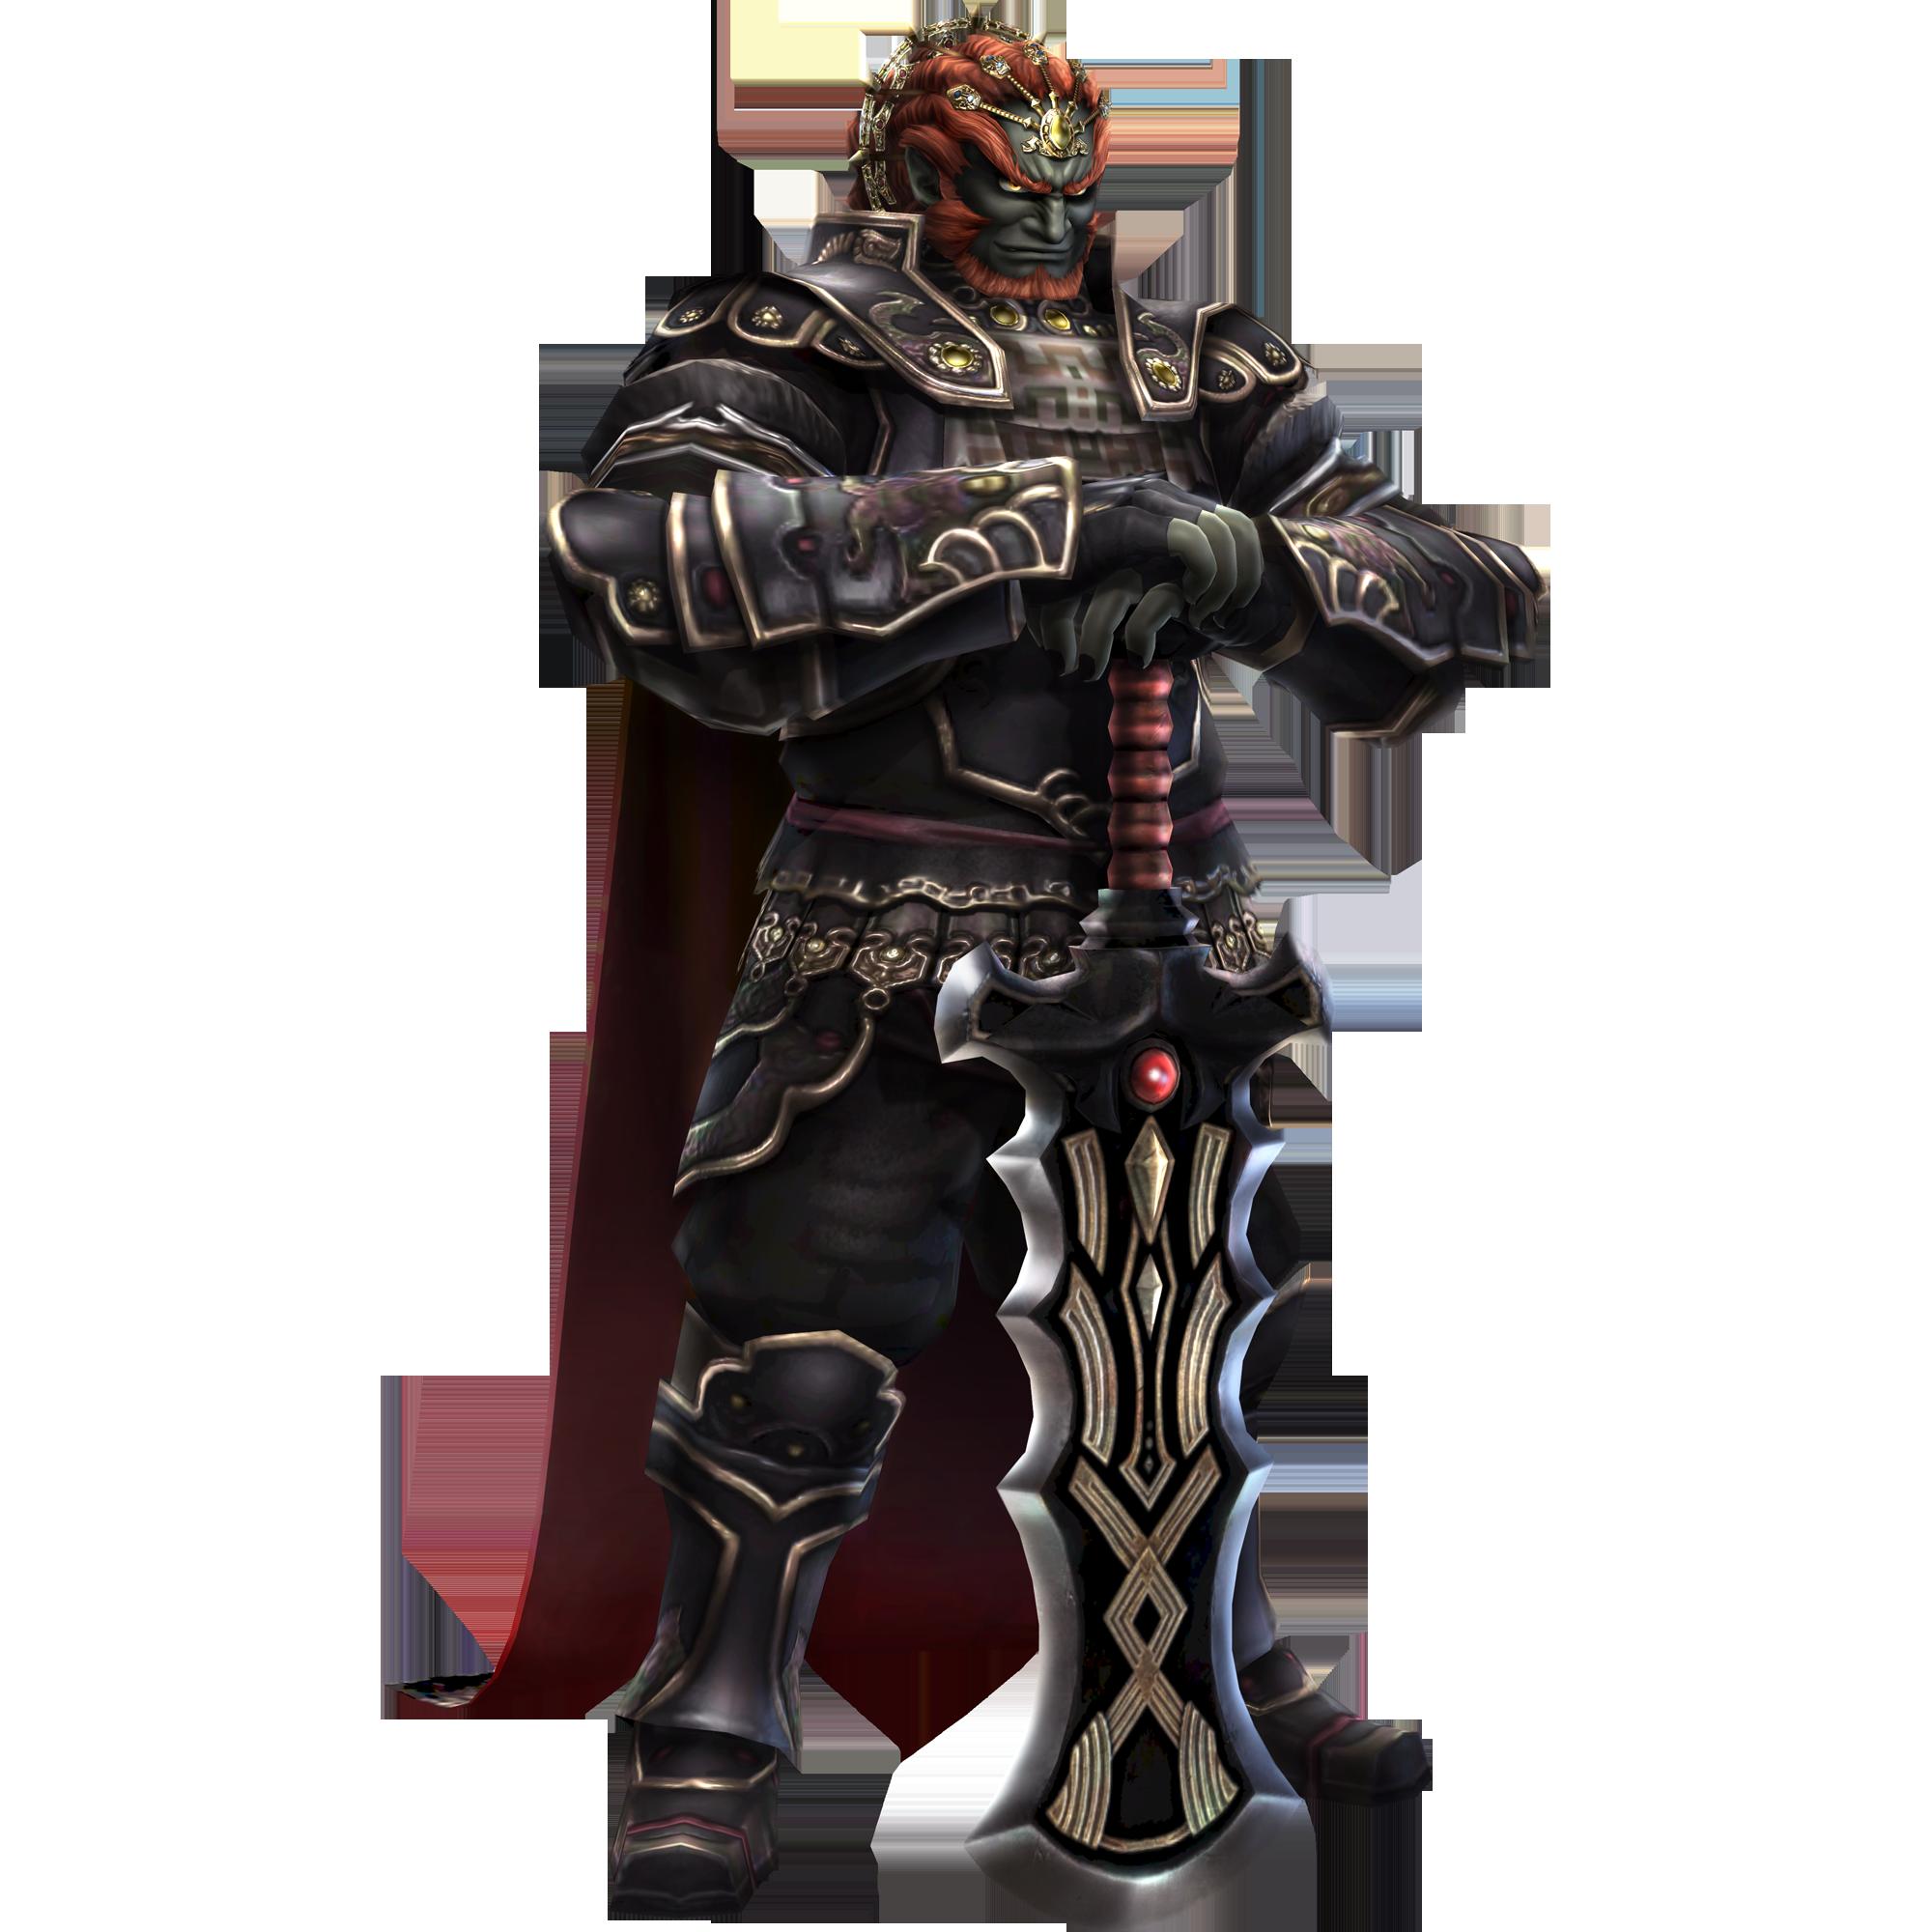 Warriors Orochi 3 Ultimate Vs Dynasty Warriors 8 Xtreme Legends: Image - Ganondorf Costume 1 - HW DLC.png